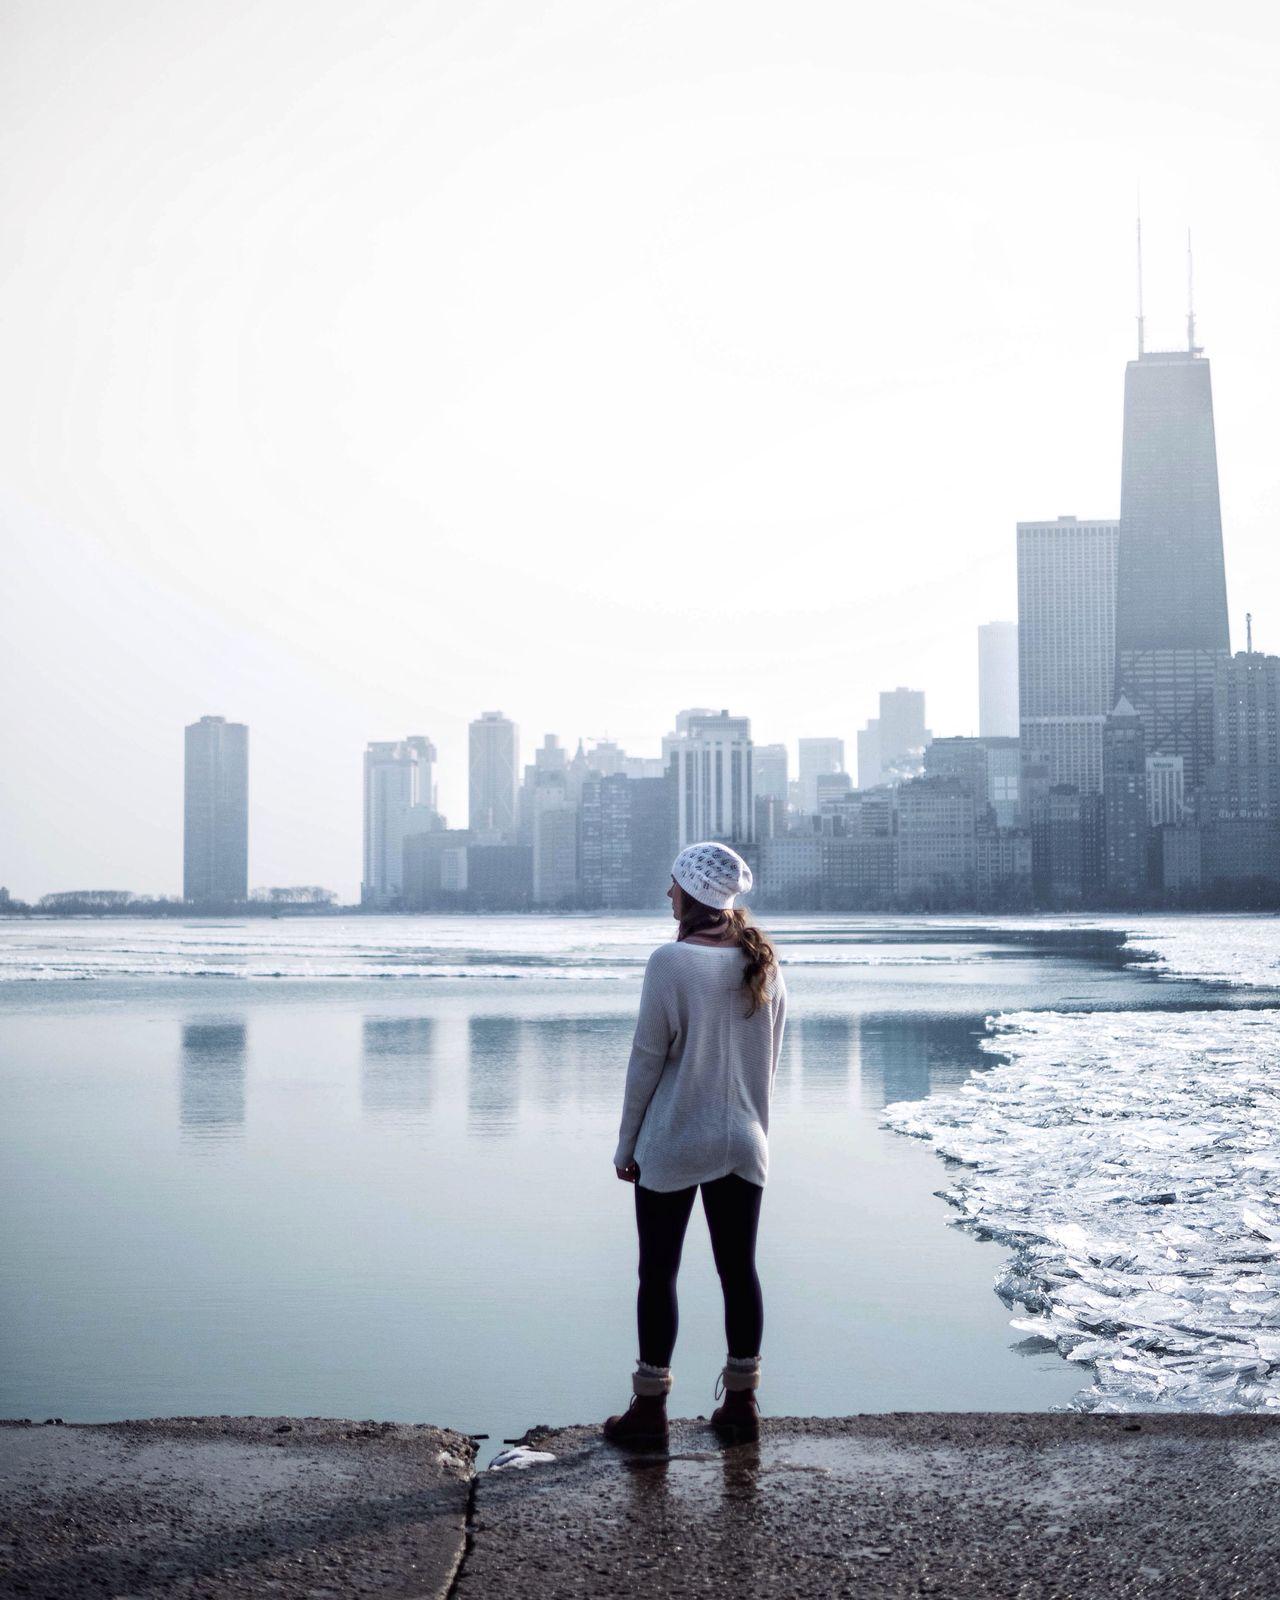 Cityscape Urban Skyline Architecture Weather Ice Chicago Skyline Chicago EyeEm Best Shots Finding New Frontiers